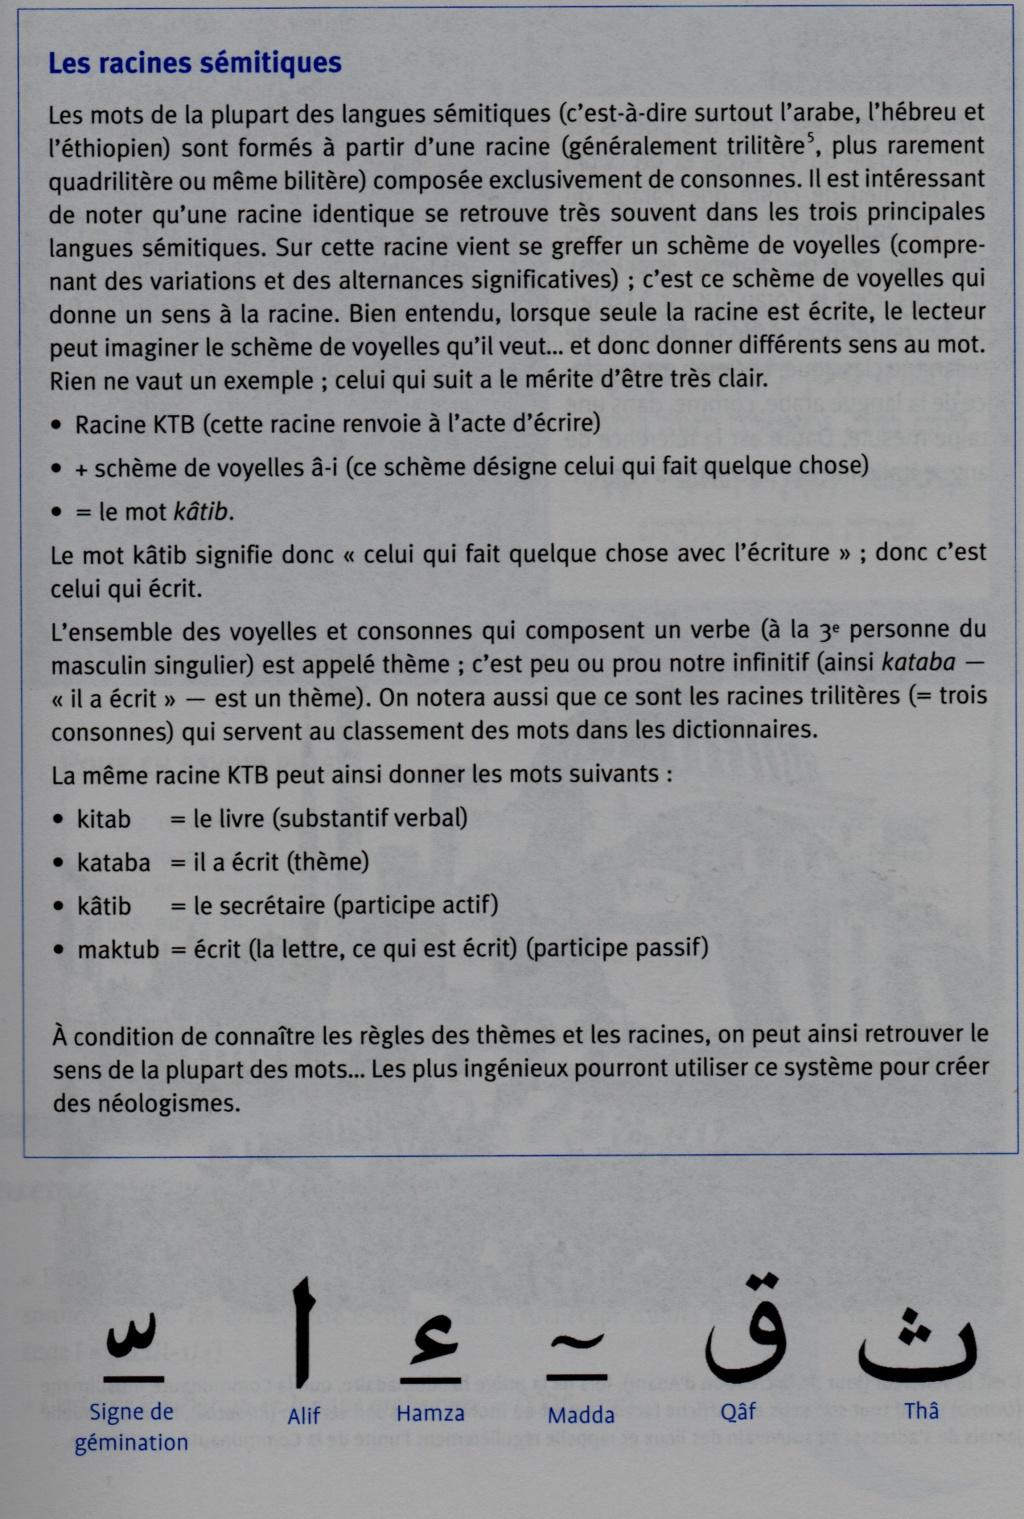 Comprendre l'islam, mots clès - Page 5 04_05_13